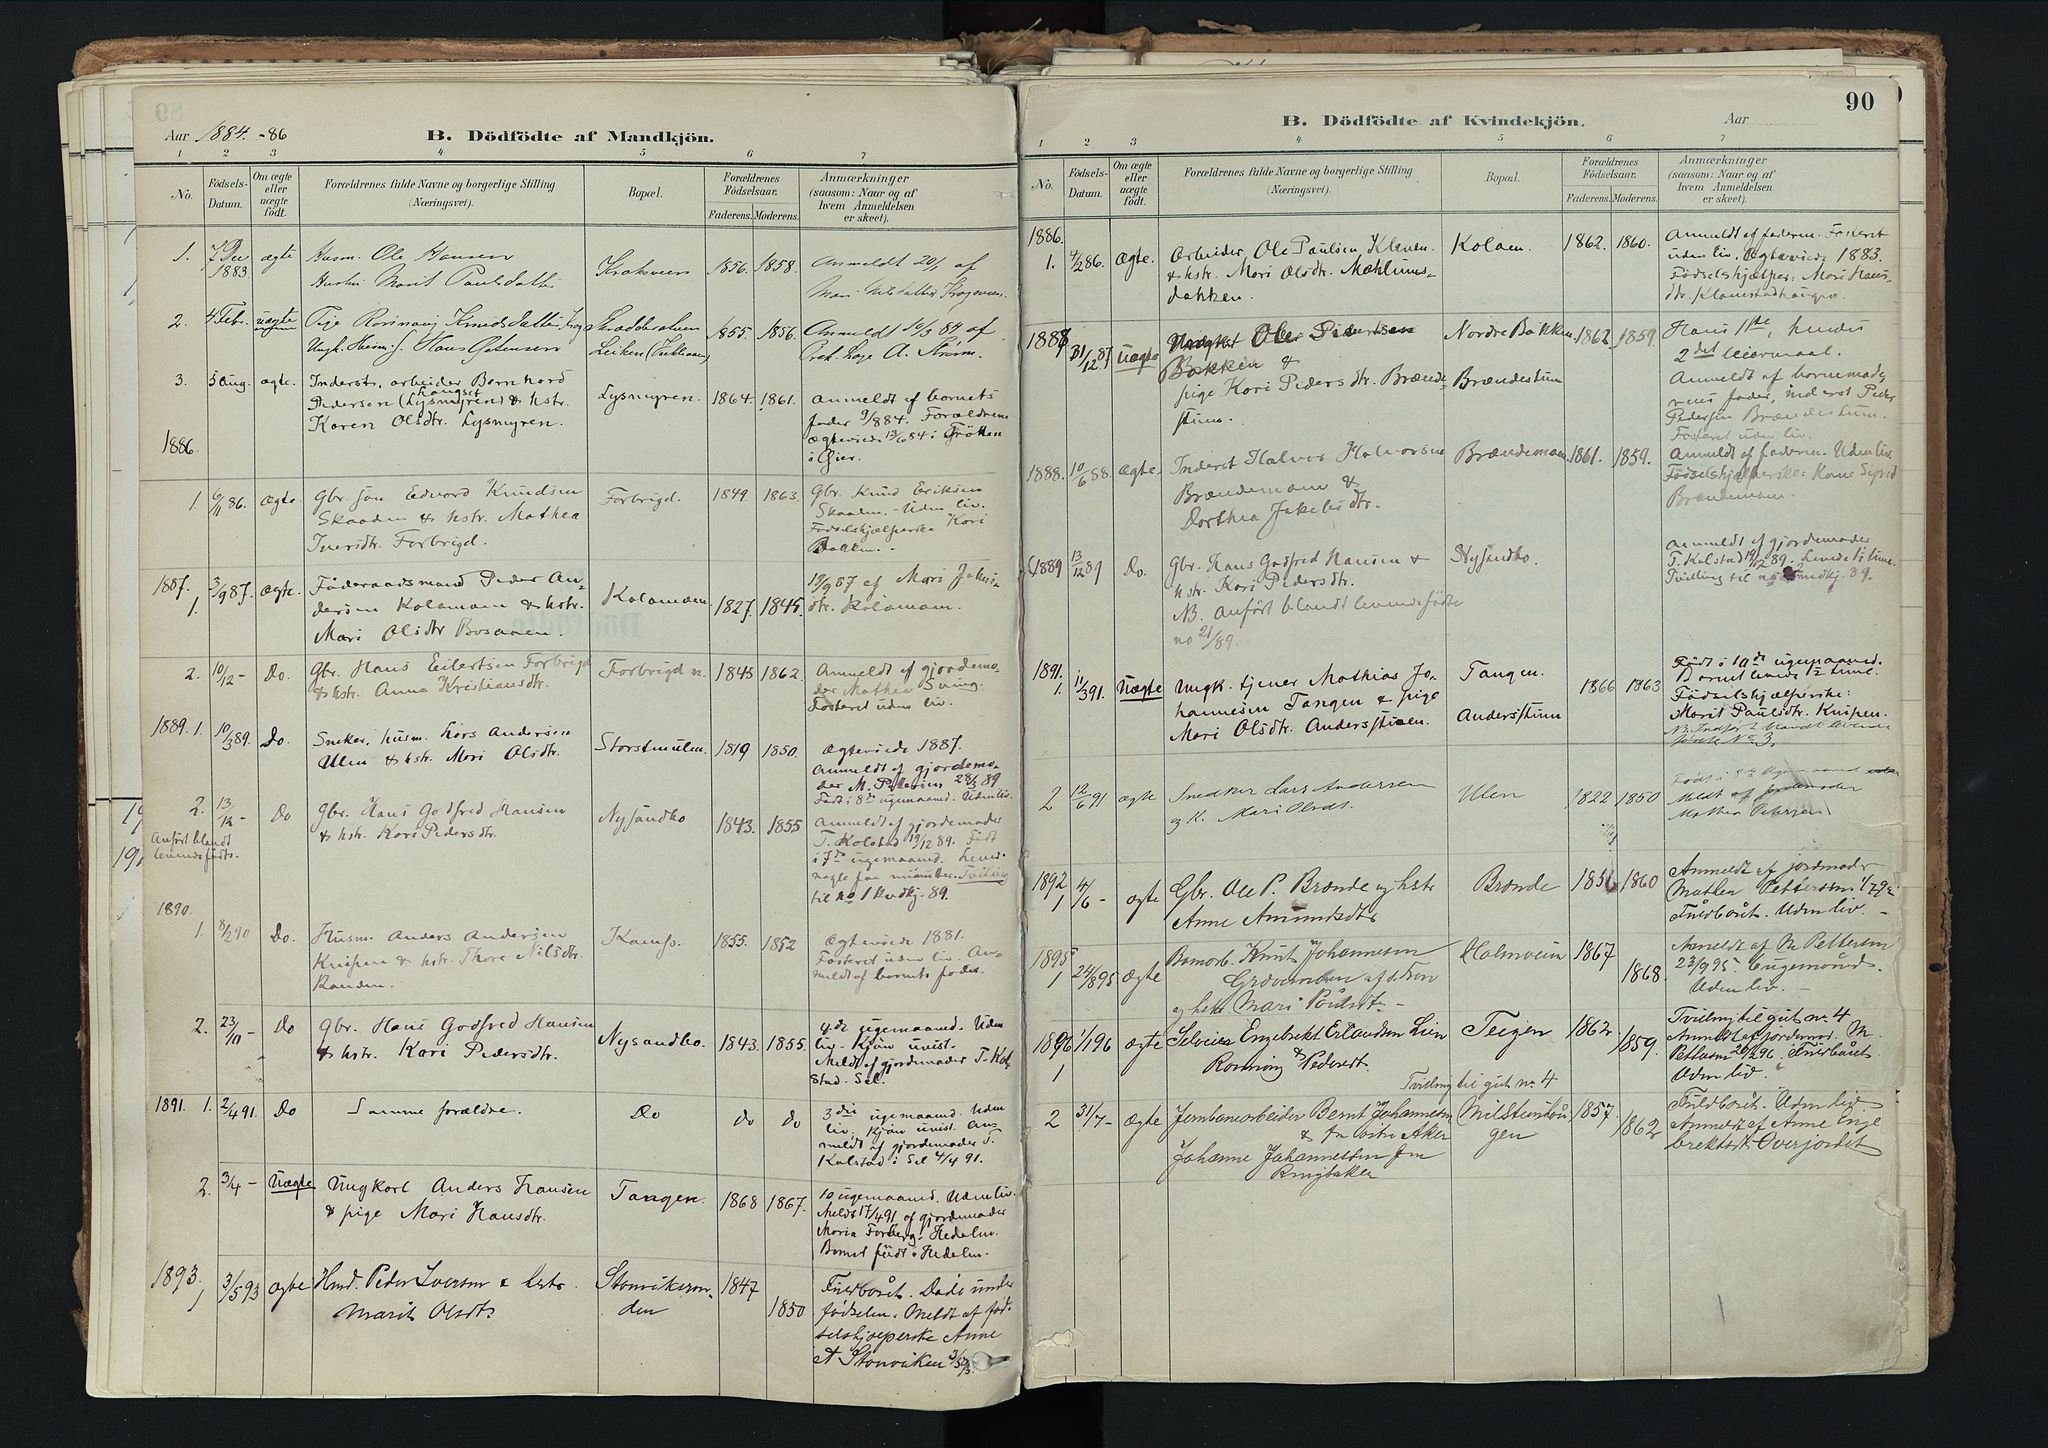 SAH, Nord-Fron prestekontor, Ministerialbok nr. 3, 1884-1914, s. 90